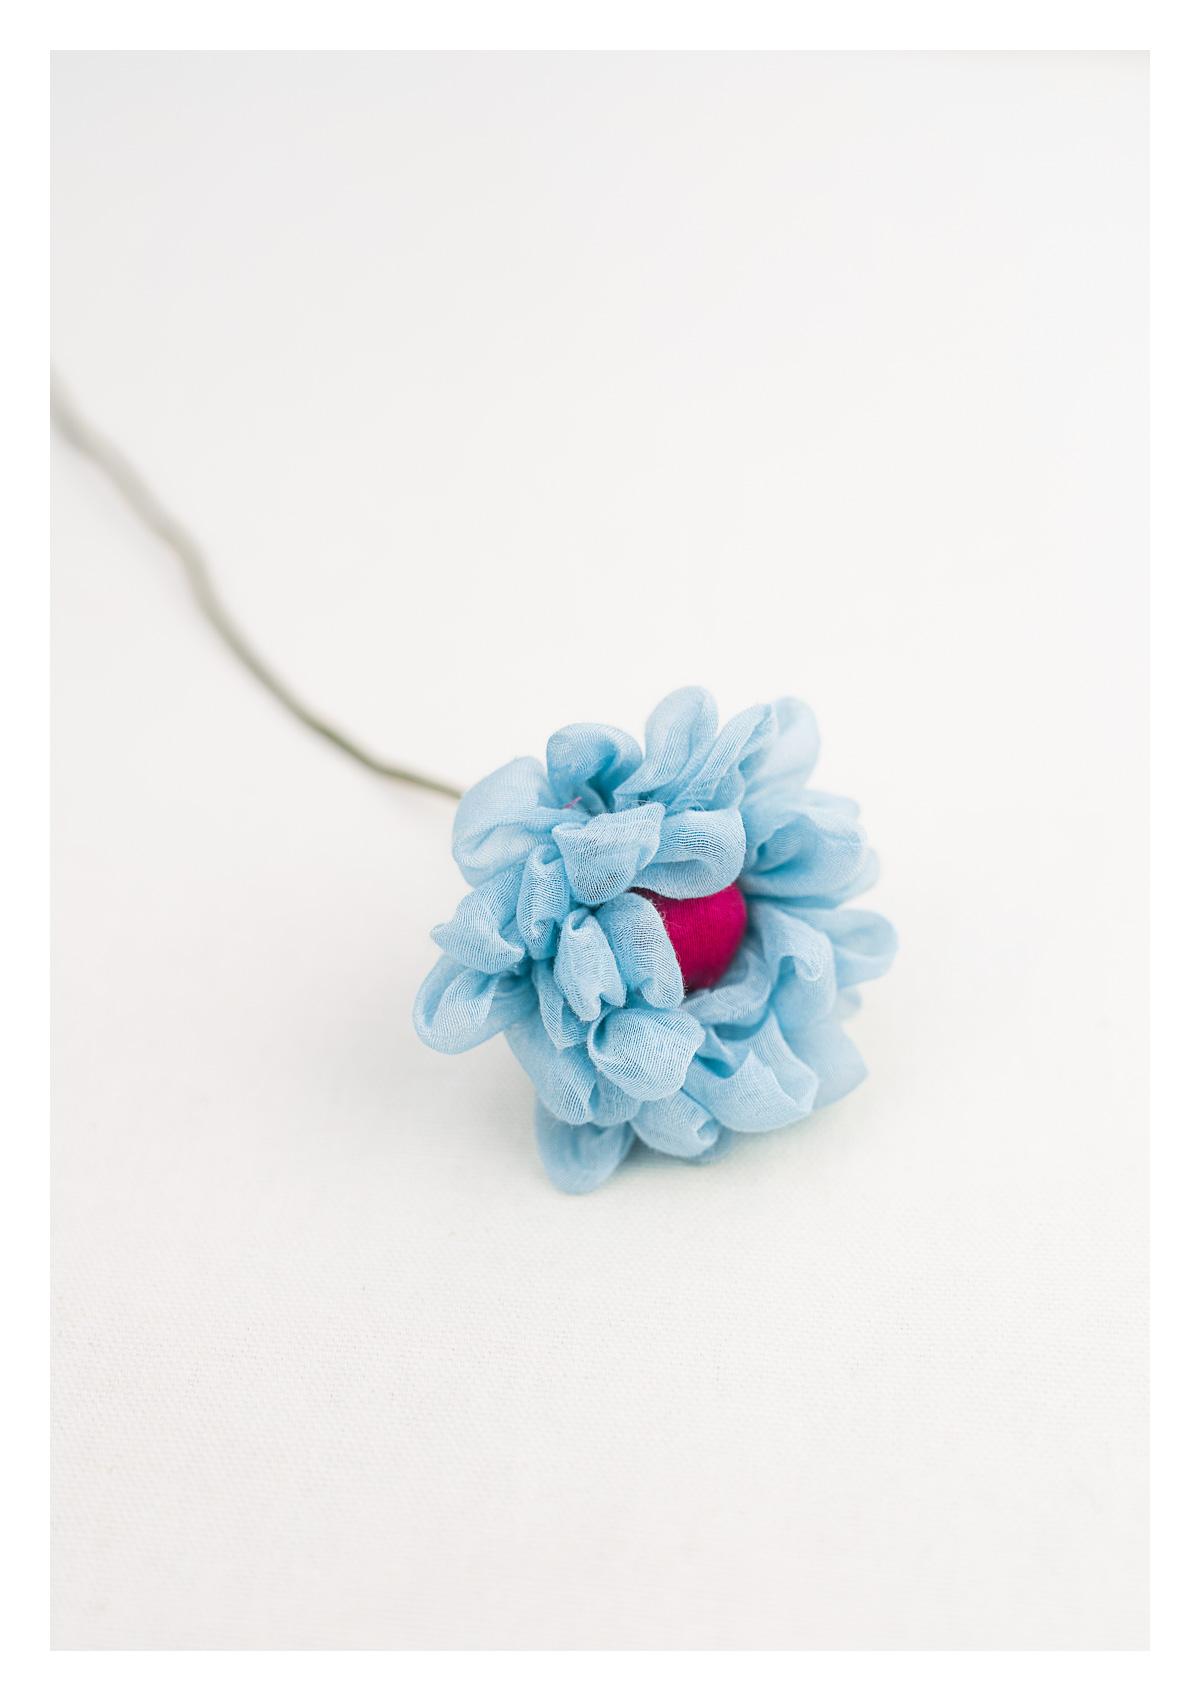 Cool Blue Textile Flower Stem